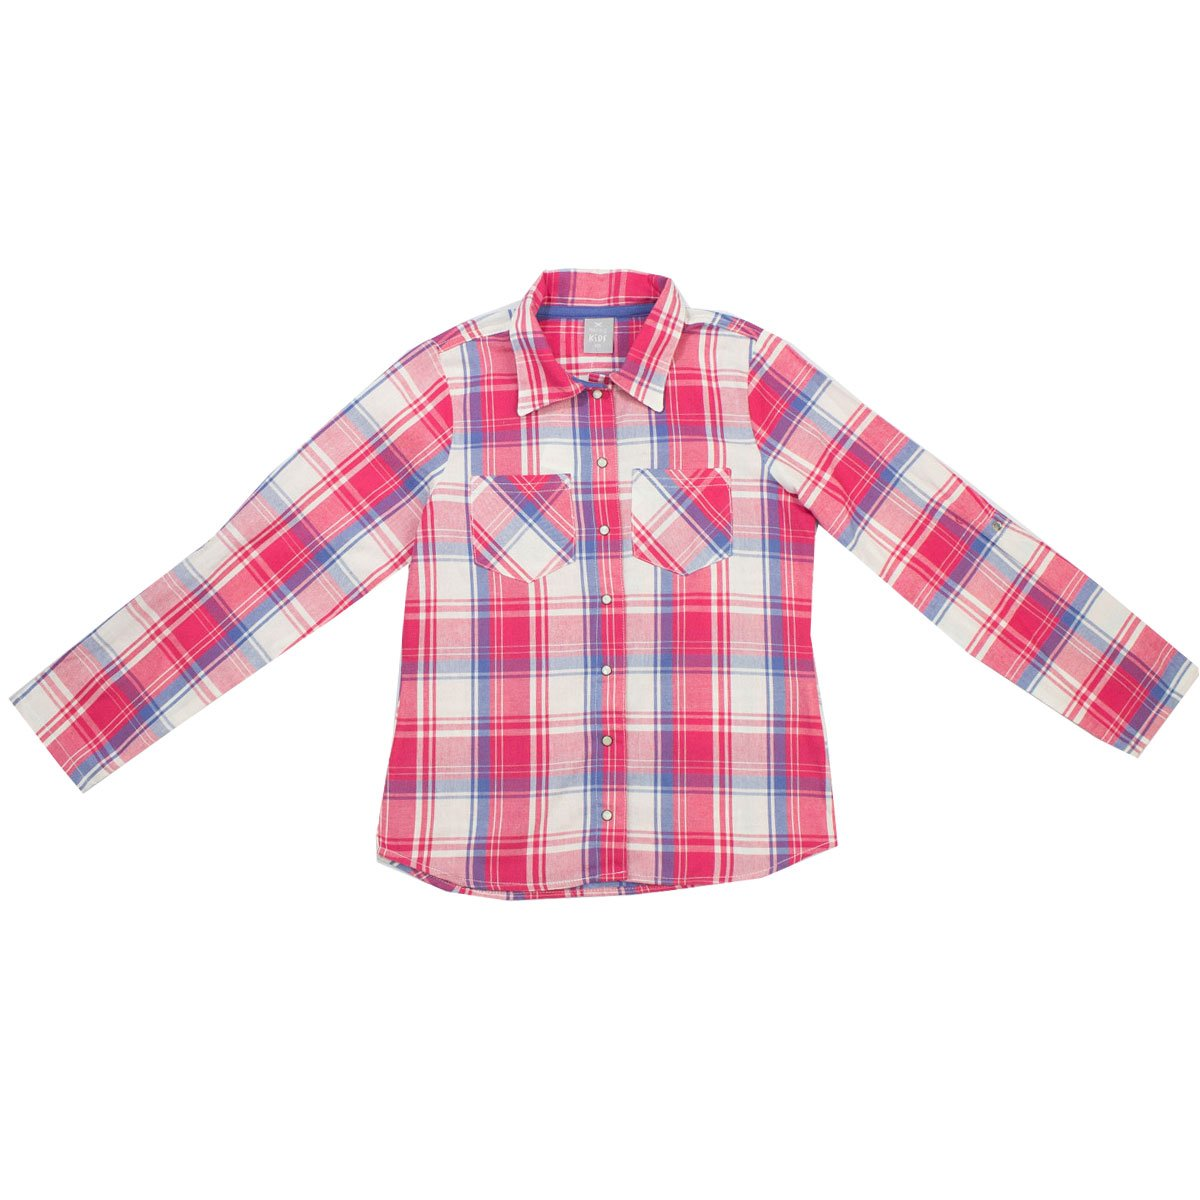 Bizz Store - Camisa Xadrez Infantil Menina Hering Kids Rosa 012d64b5e7034